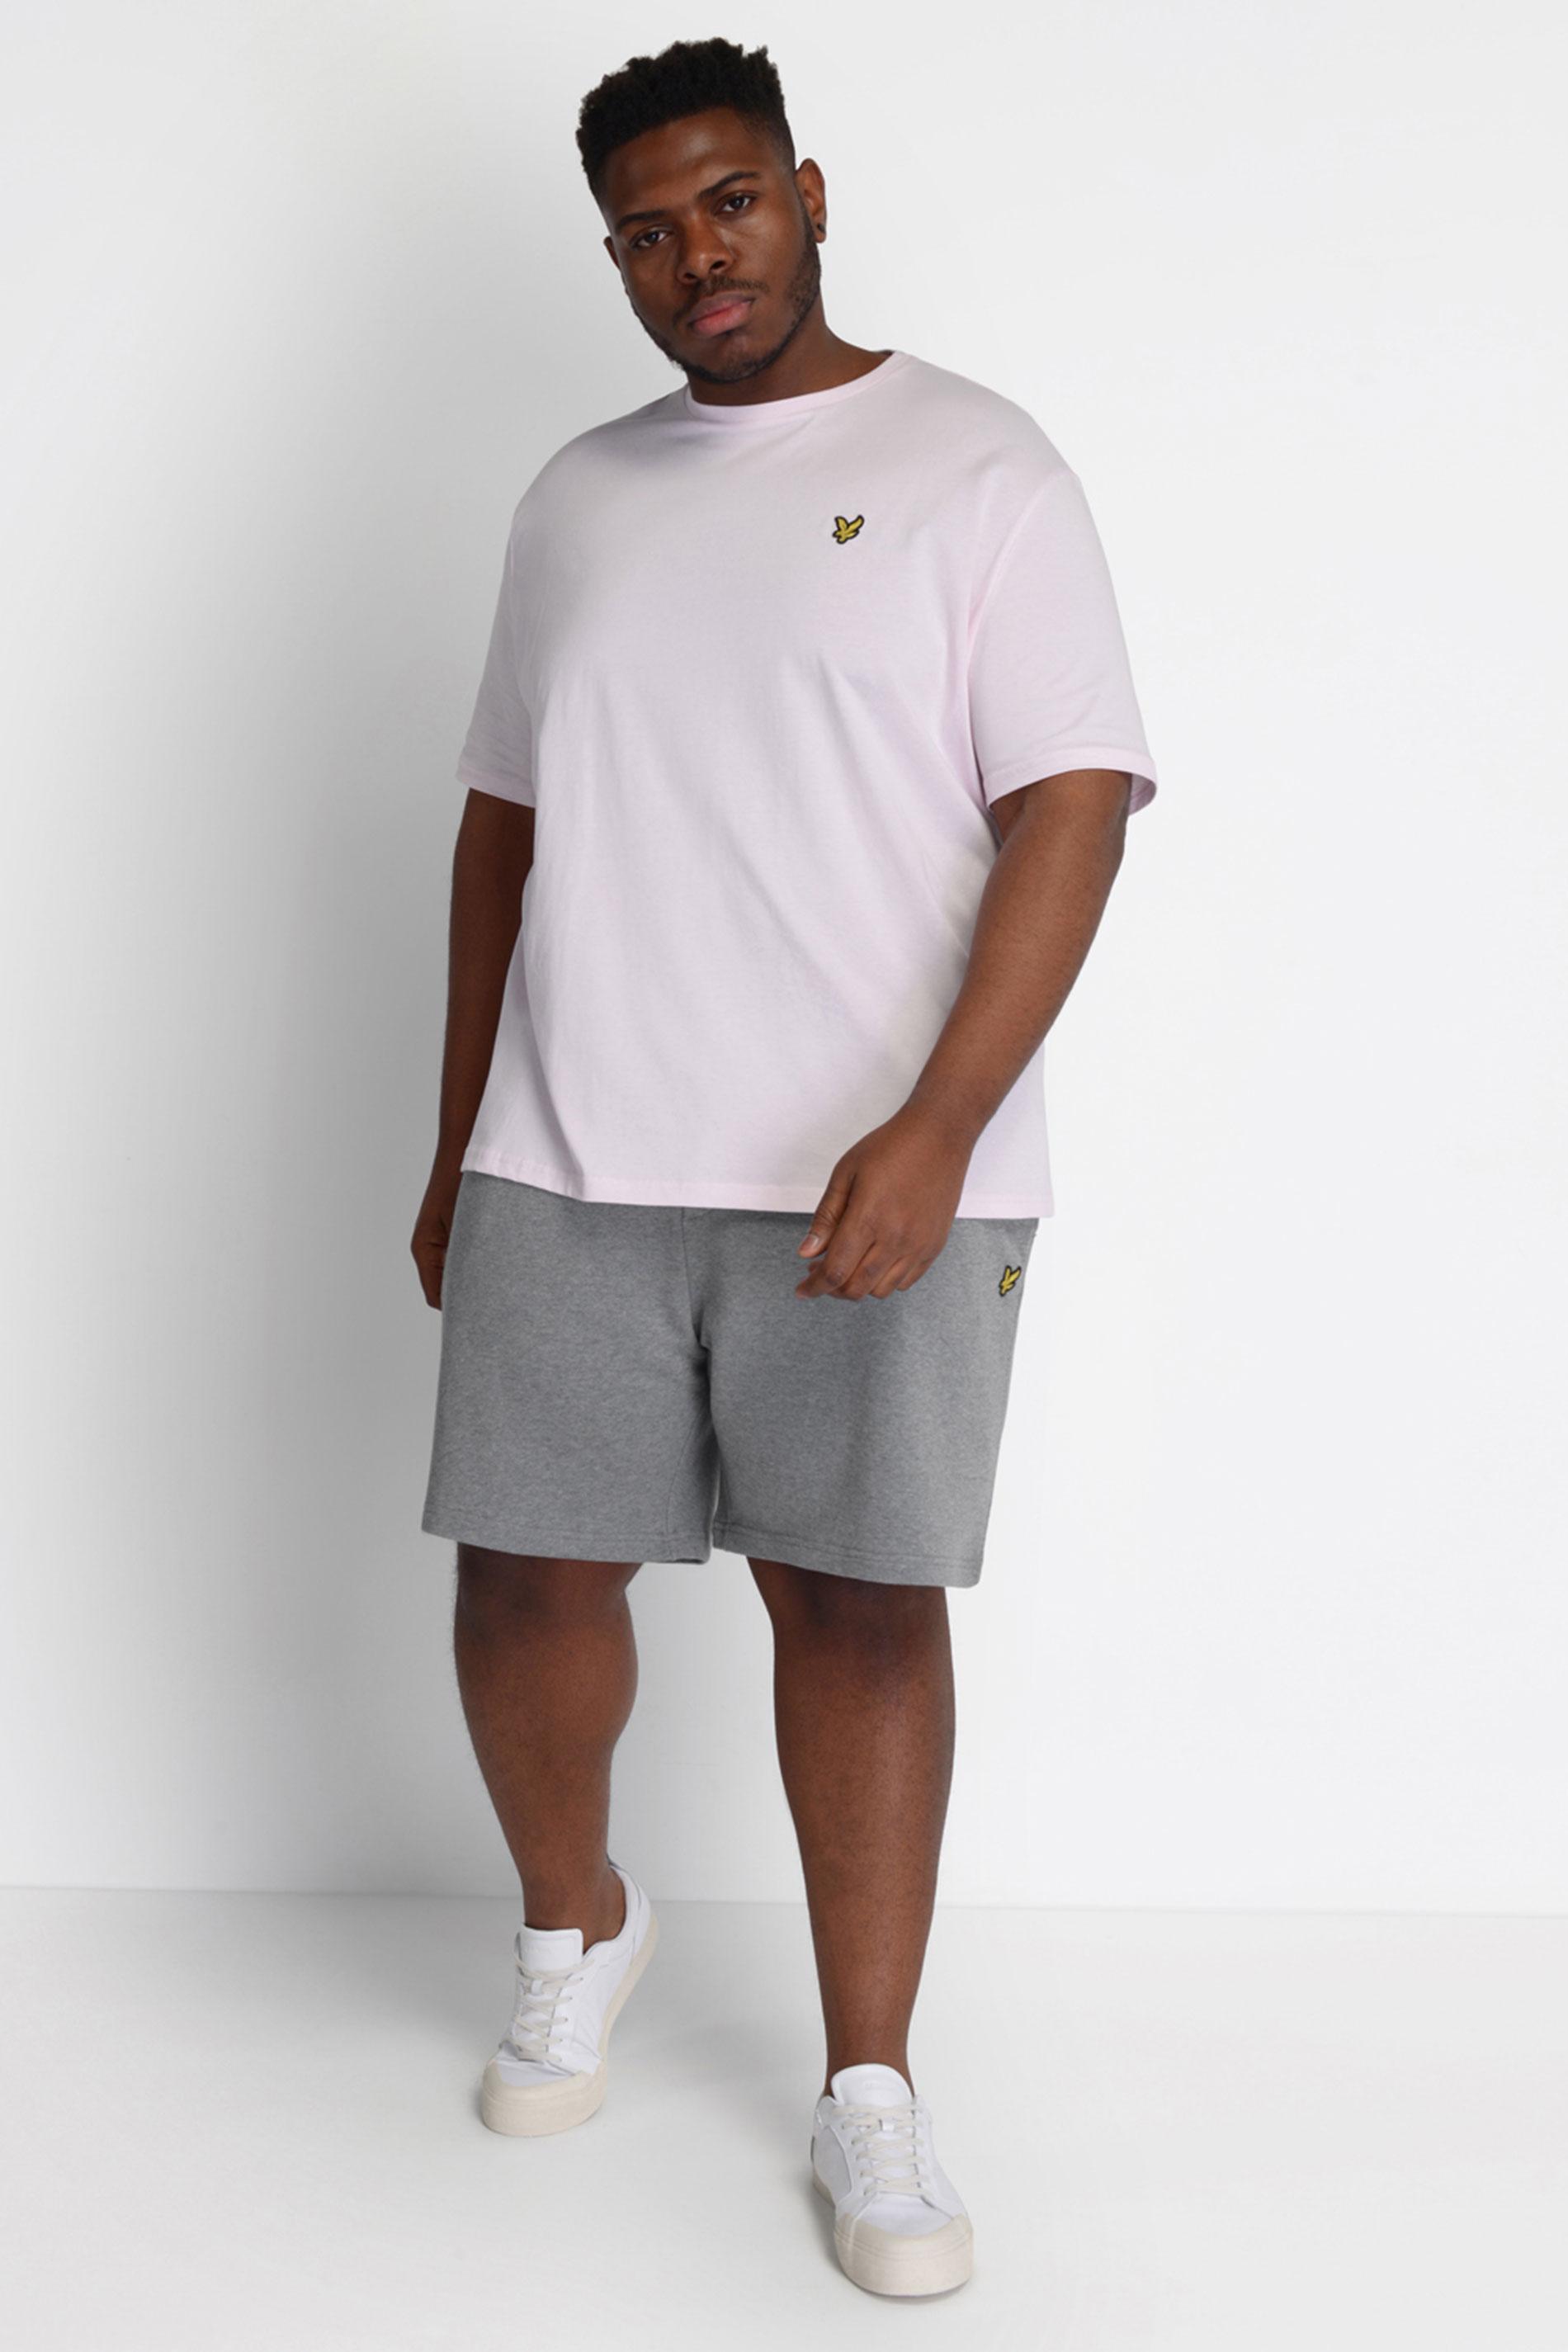 LYLE & SCOTT Grey Jogger Shorts_B.jpg